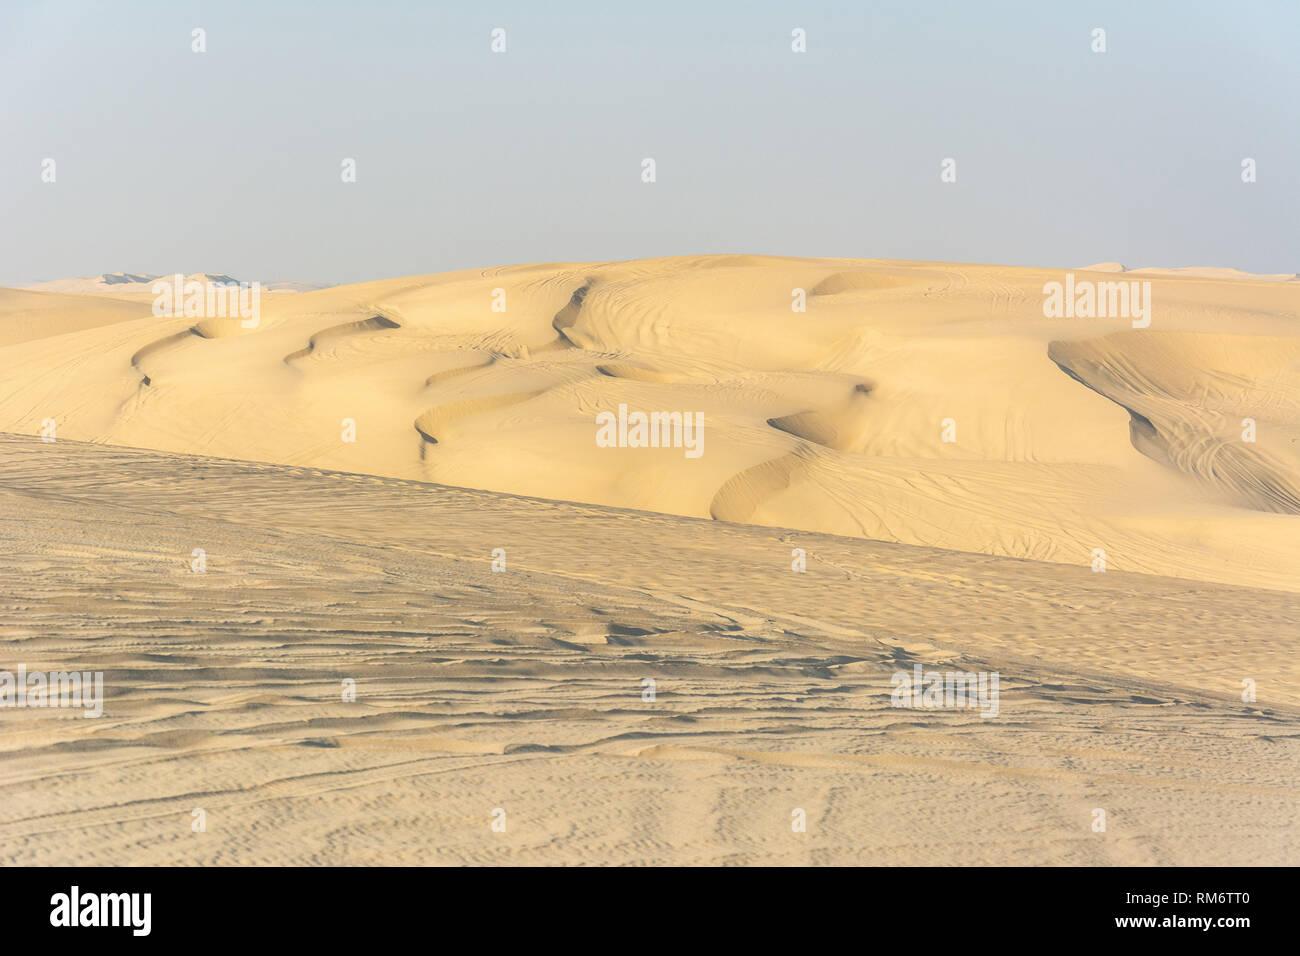 Sand dunes in Khor Al Adaid desert in Qatar. - Stock Image